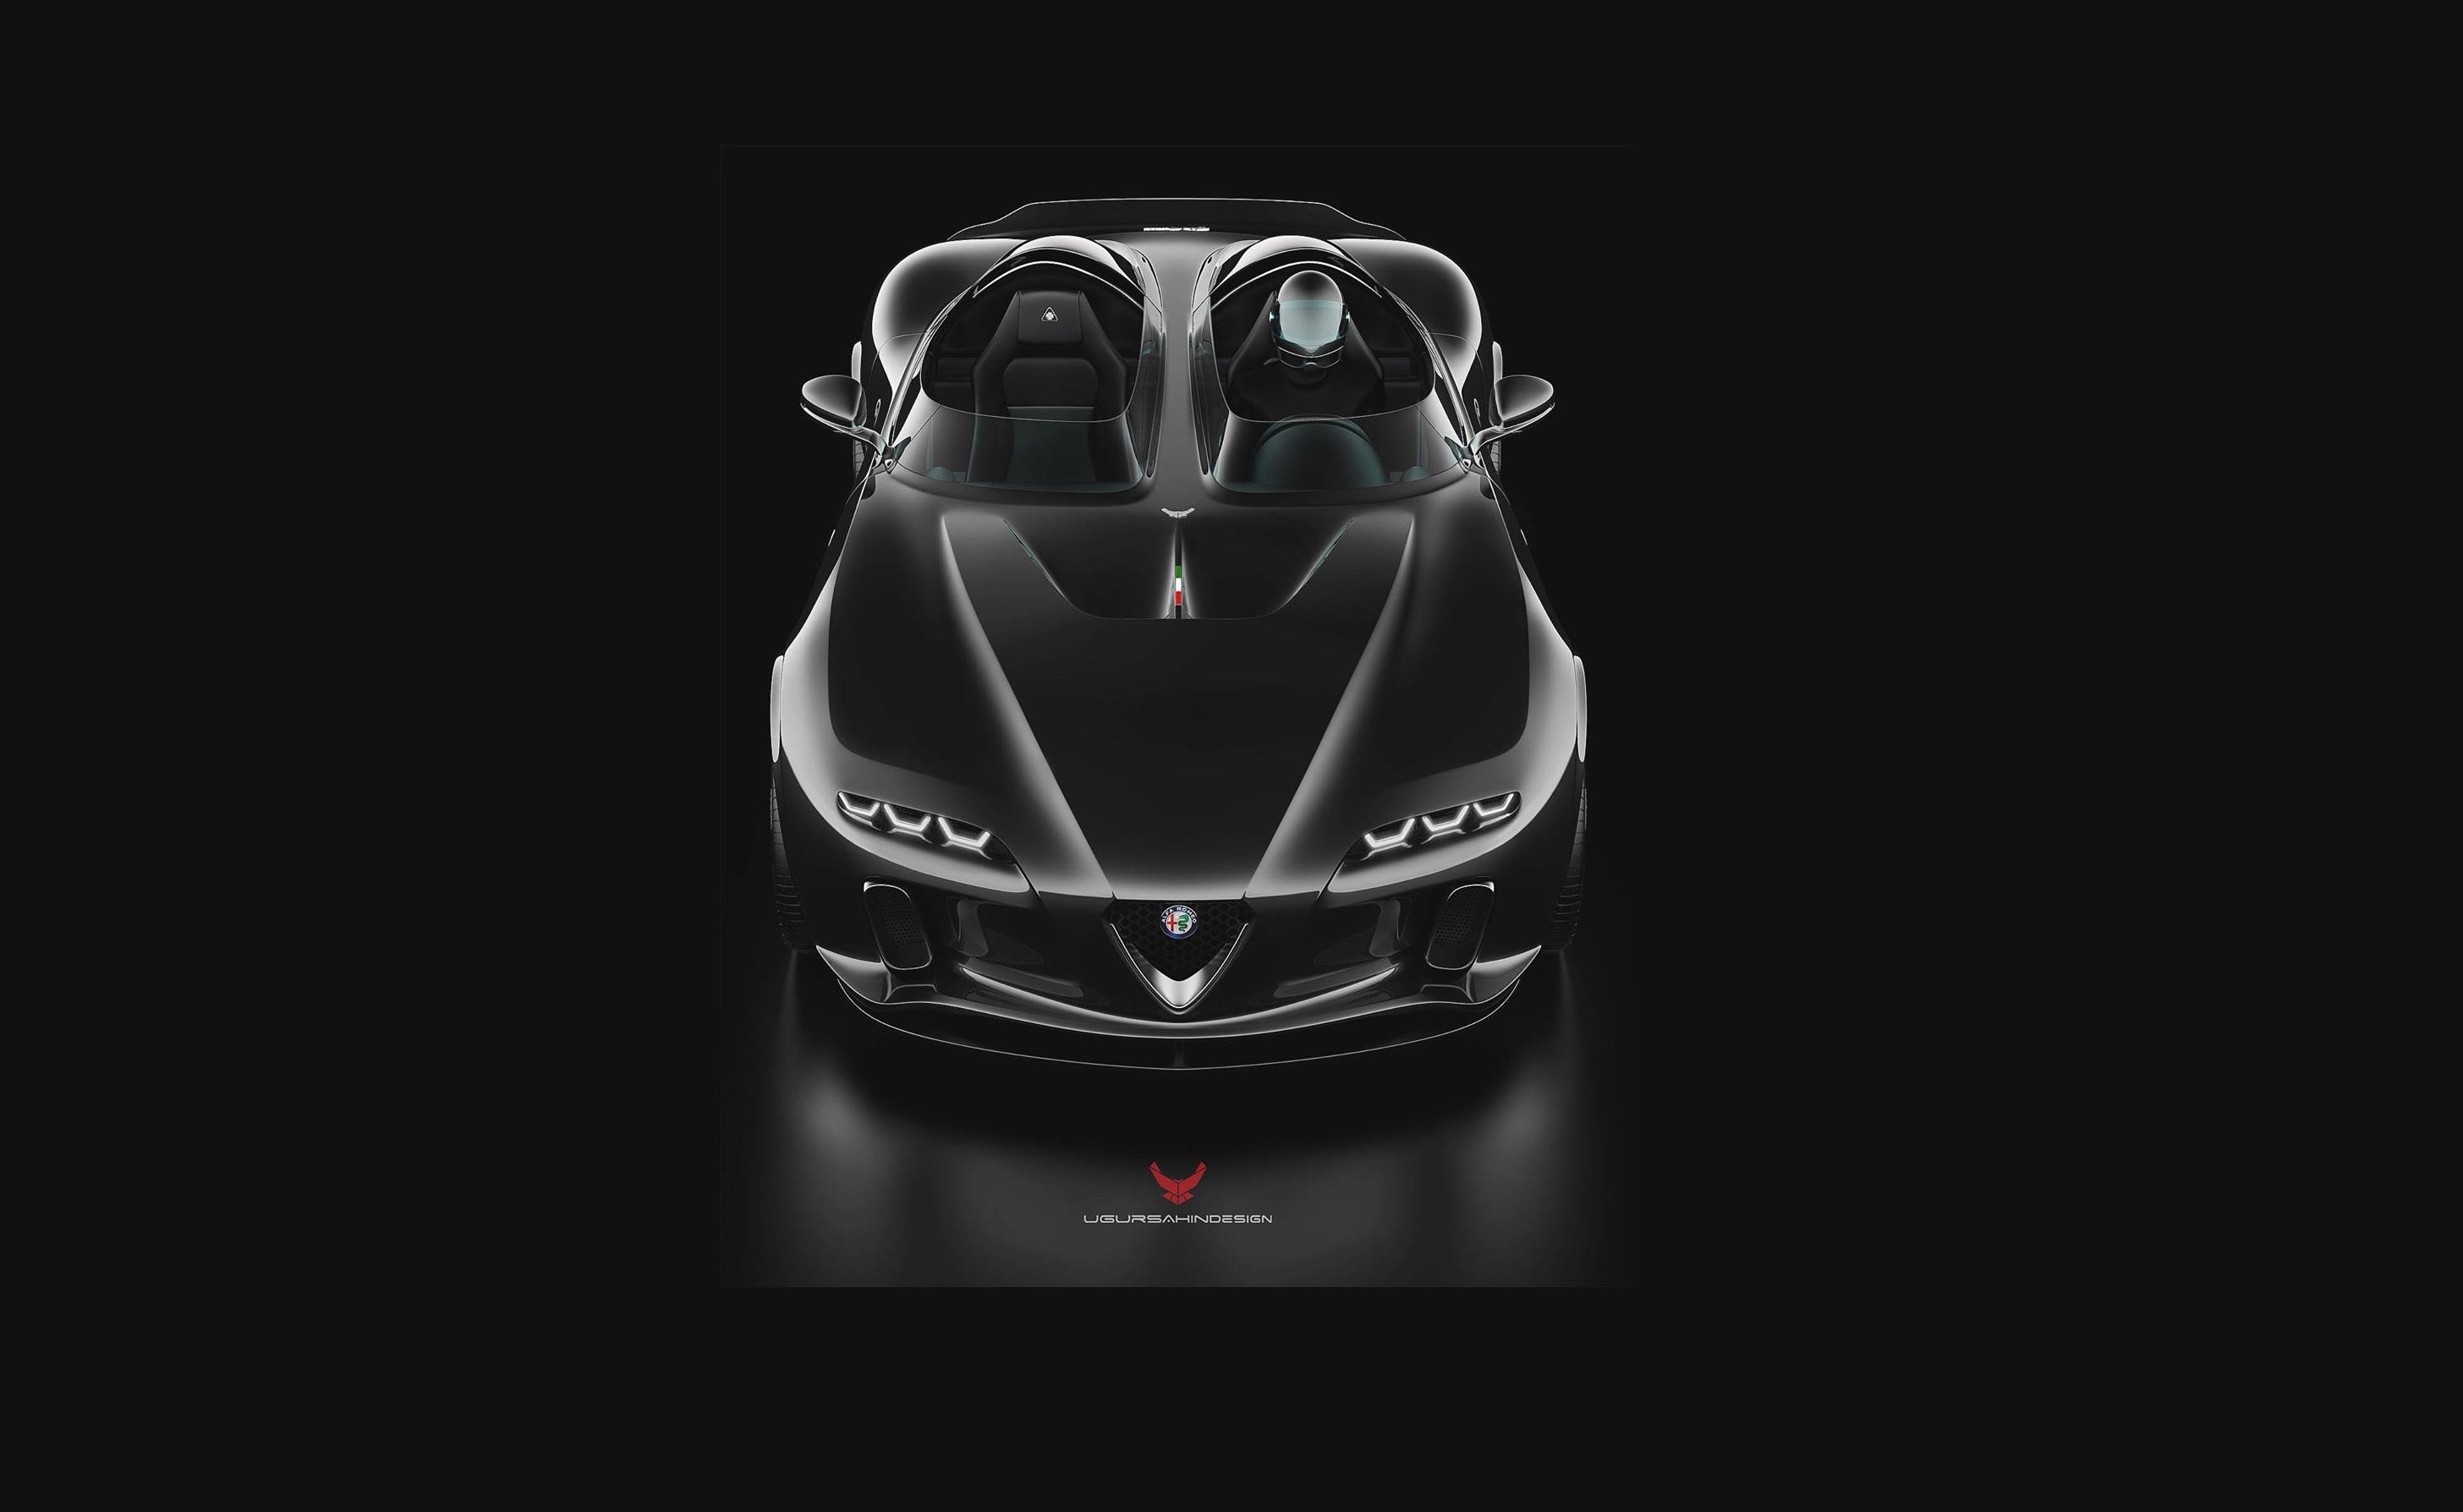 Alfa Romeo Usd Barchetta Design Study Looks Marvelous Ideally Packs 700 Hp Autoevolution